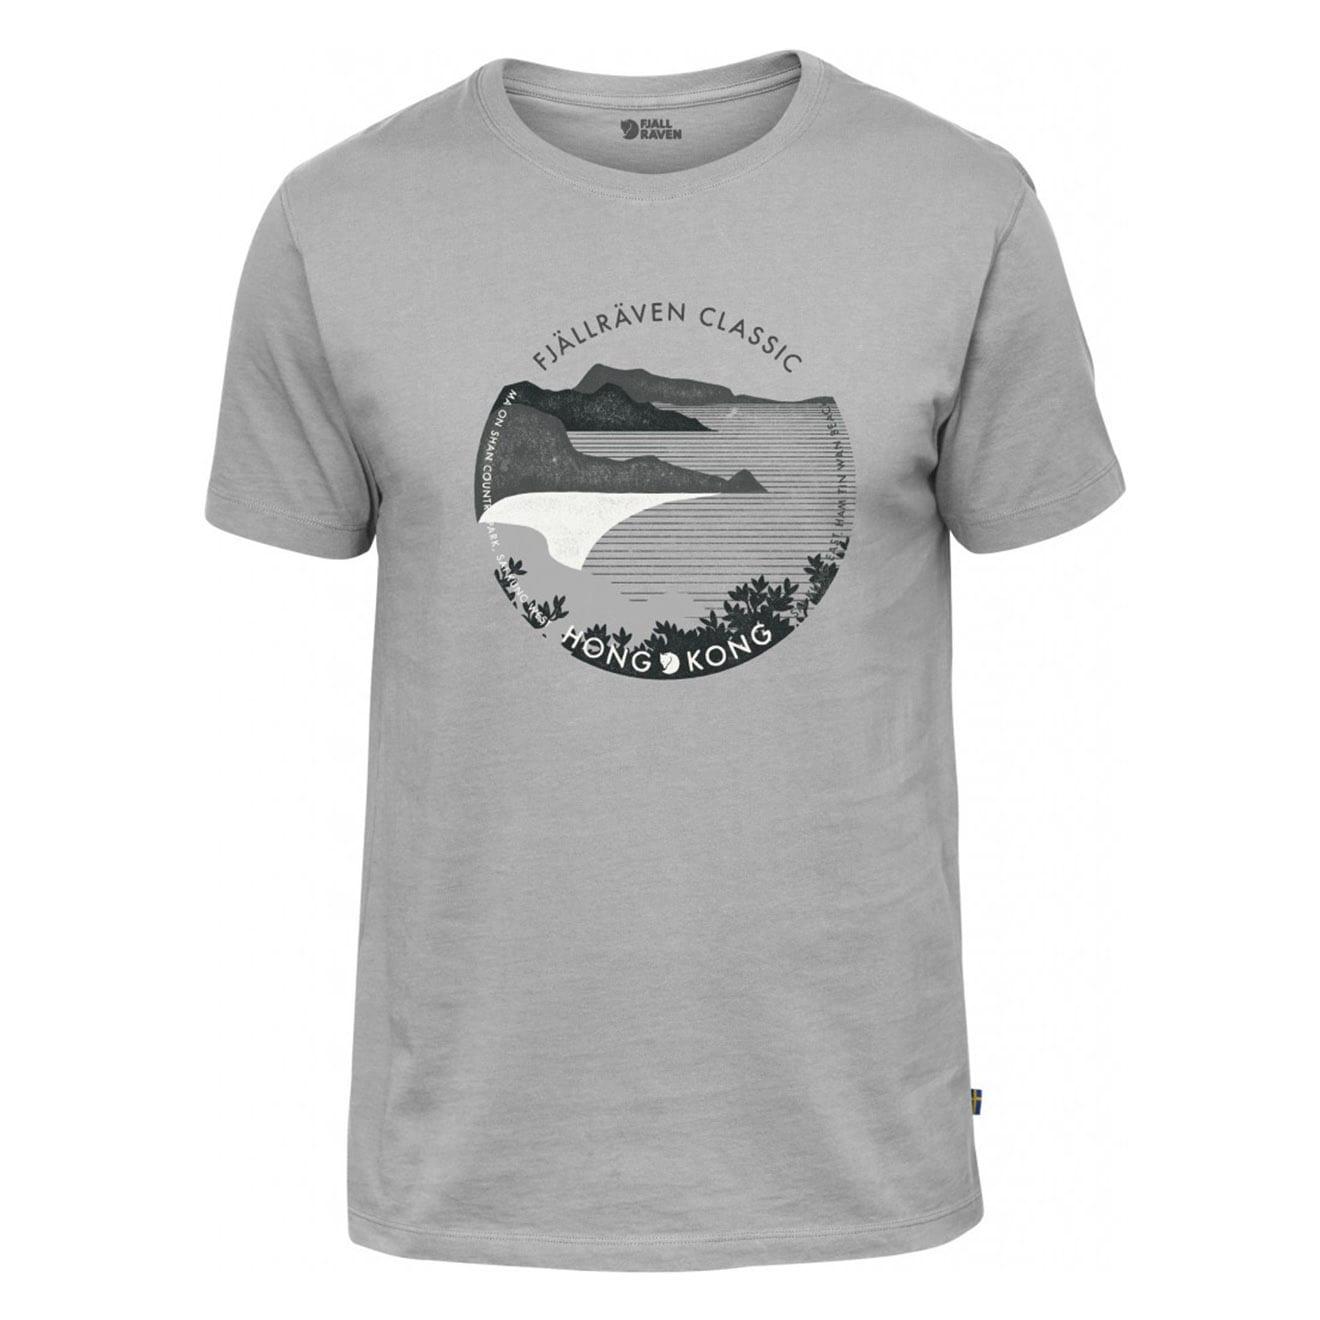 Fjallraven Classic HK T-Shirt Grey